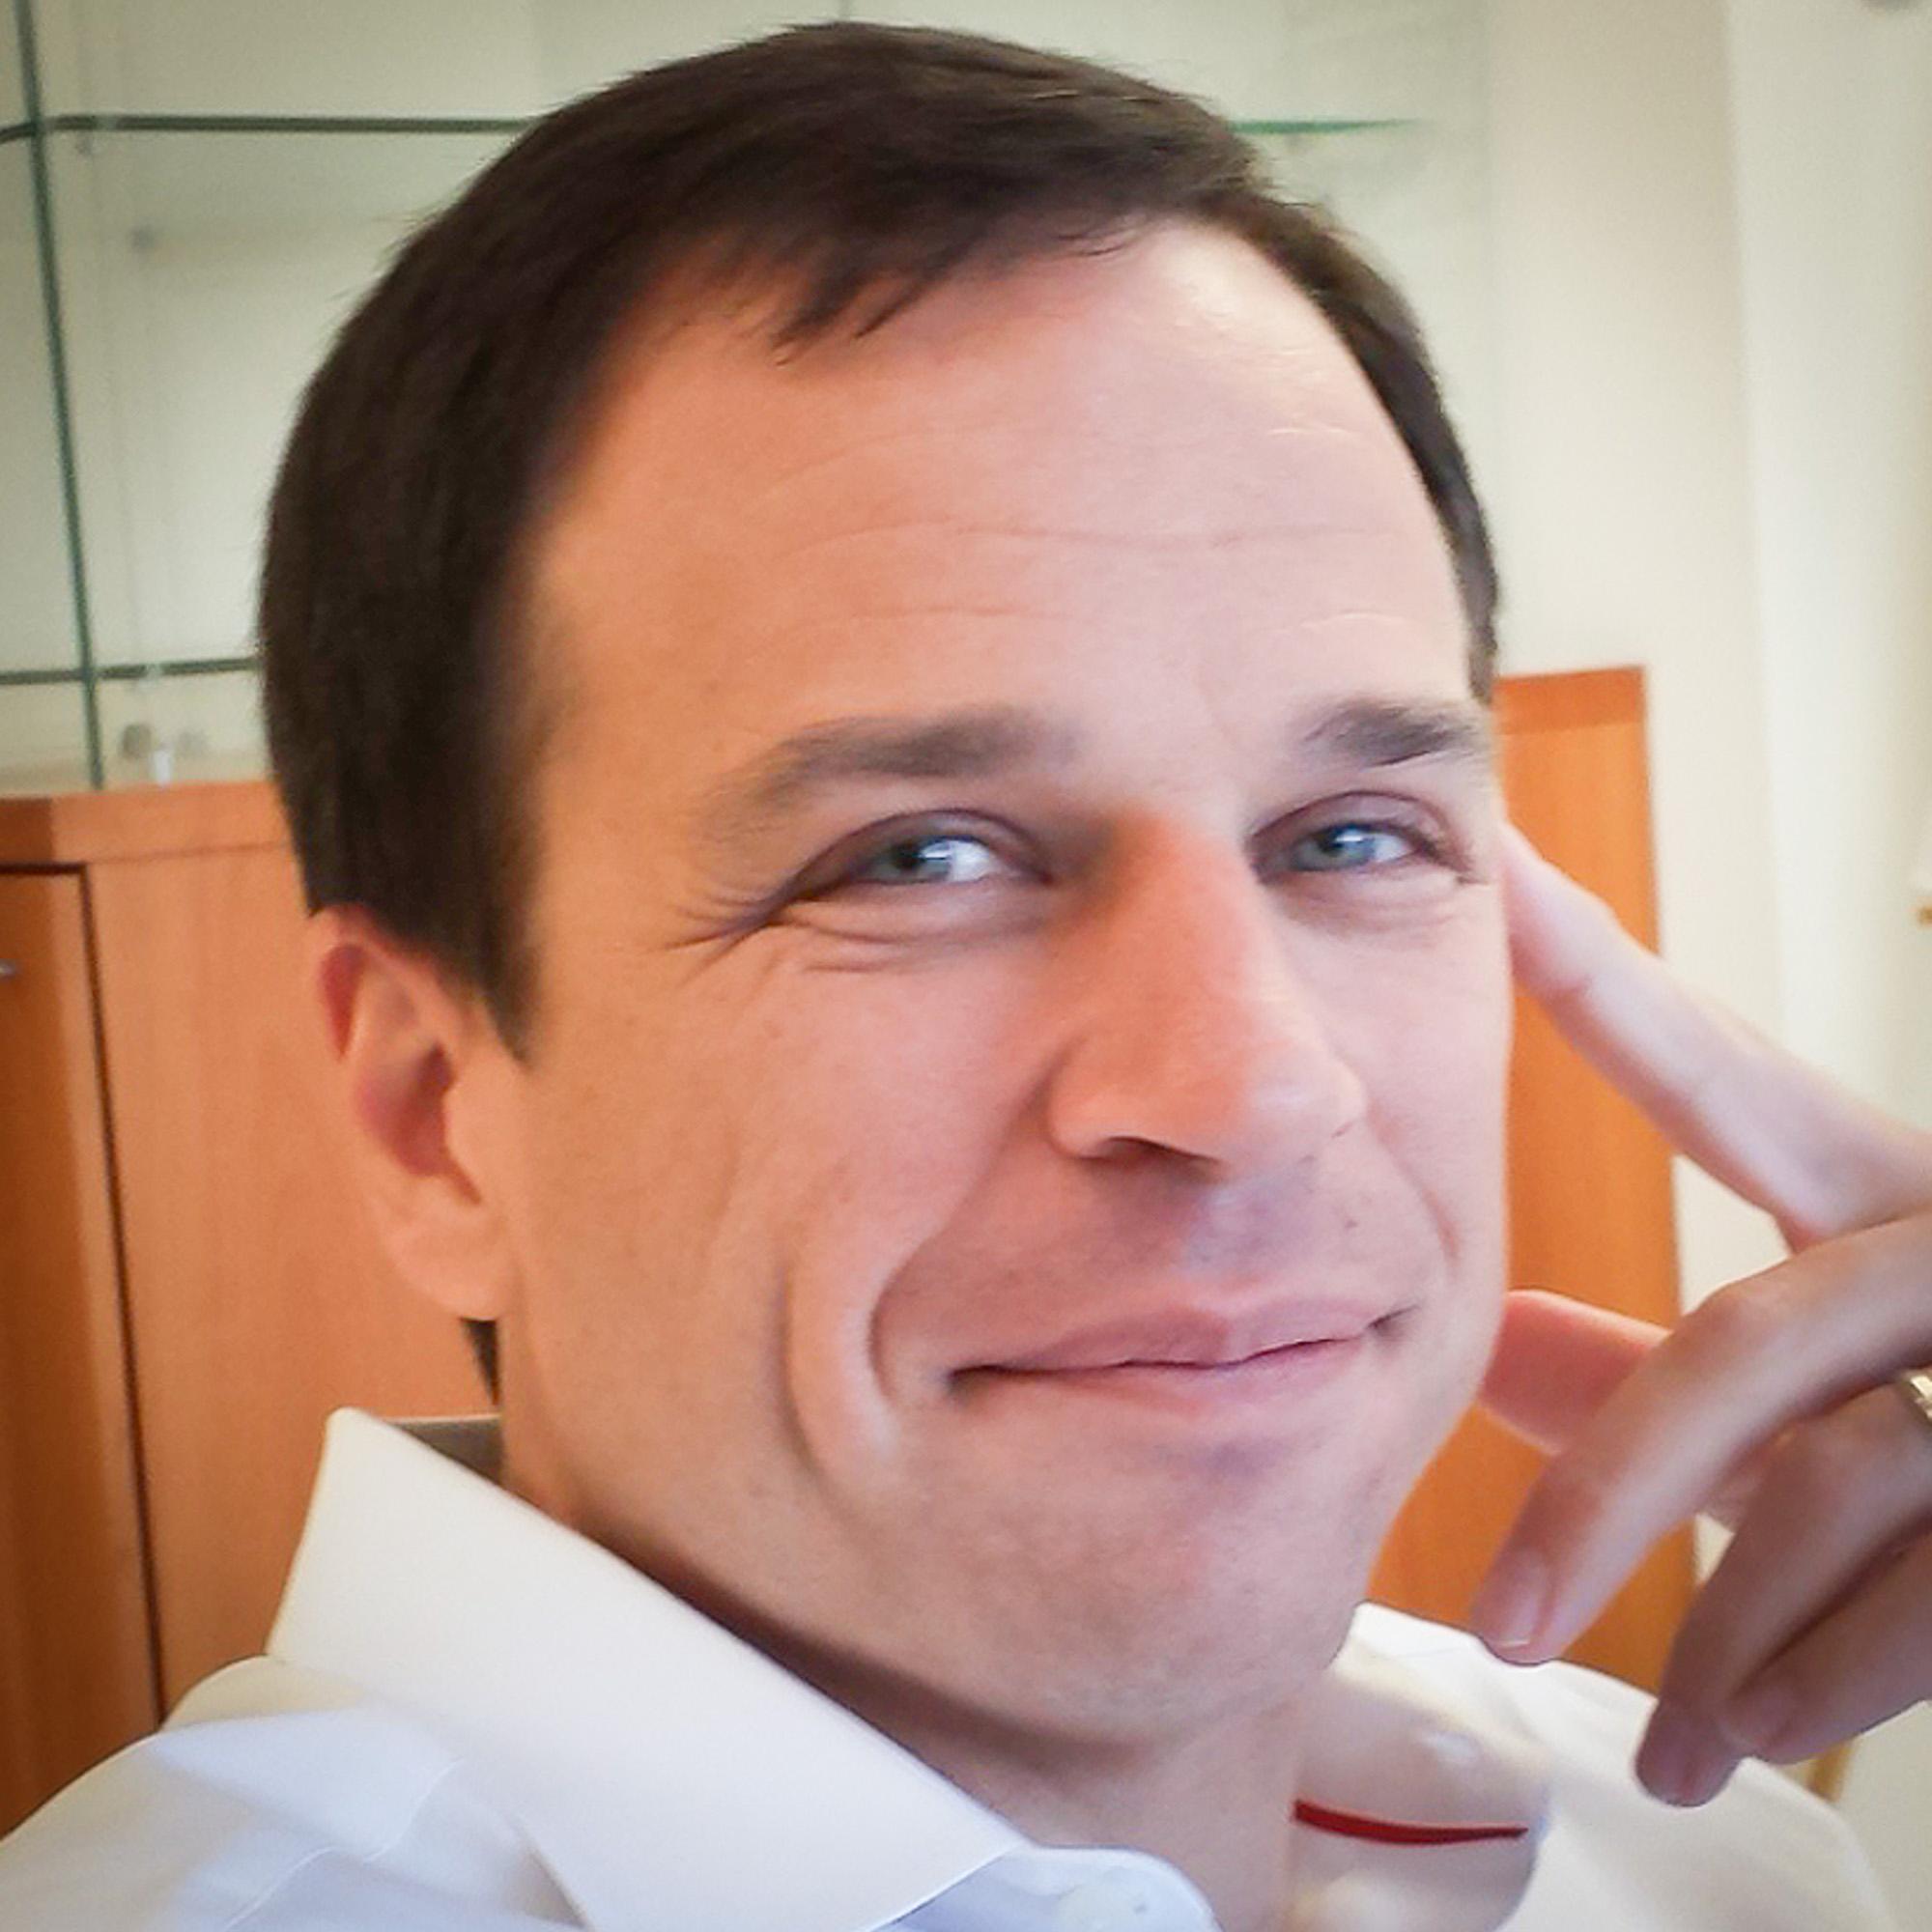 "<a href=""https://www.linkedin.com/in/aymericvigneras"" target=""_blank""><i> Aymeric Vigneras</i></a><br><font size=""-1""> Co-founder & CEO </font><br><b>Sharalike</b>"